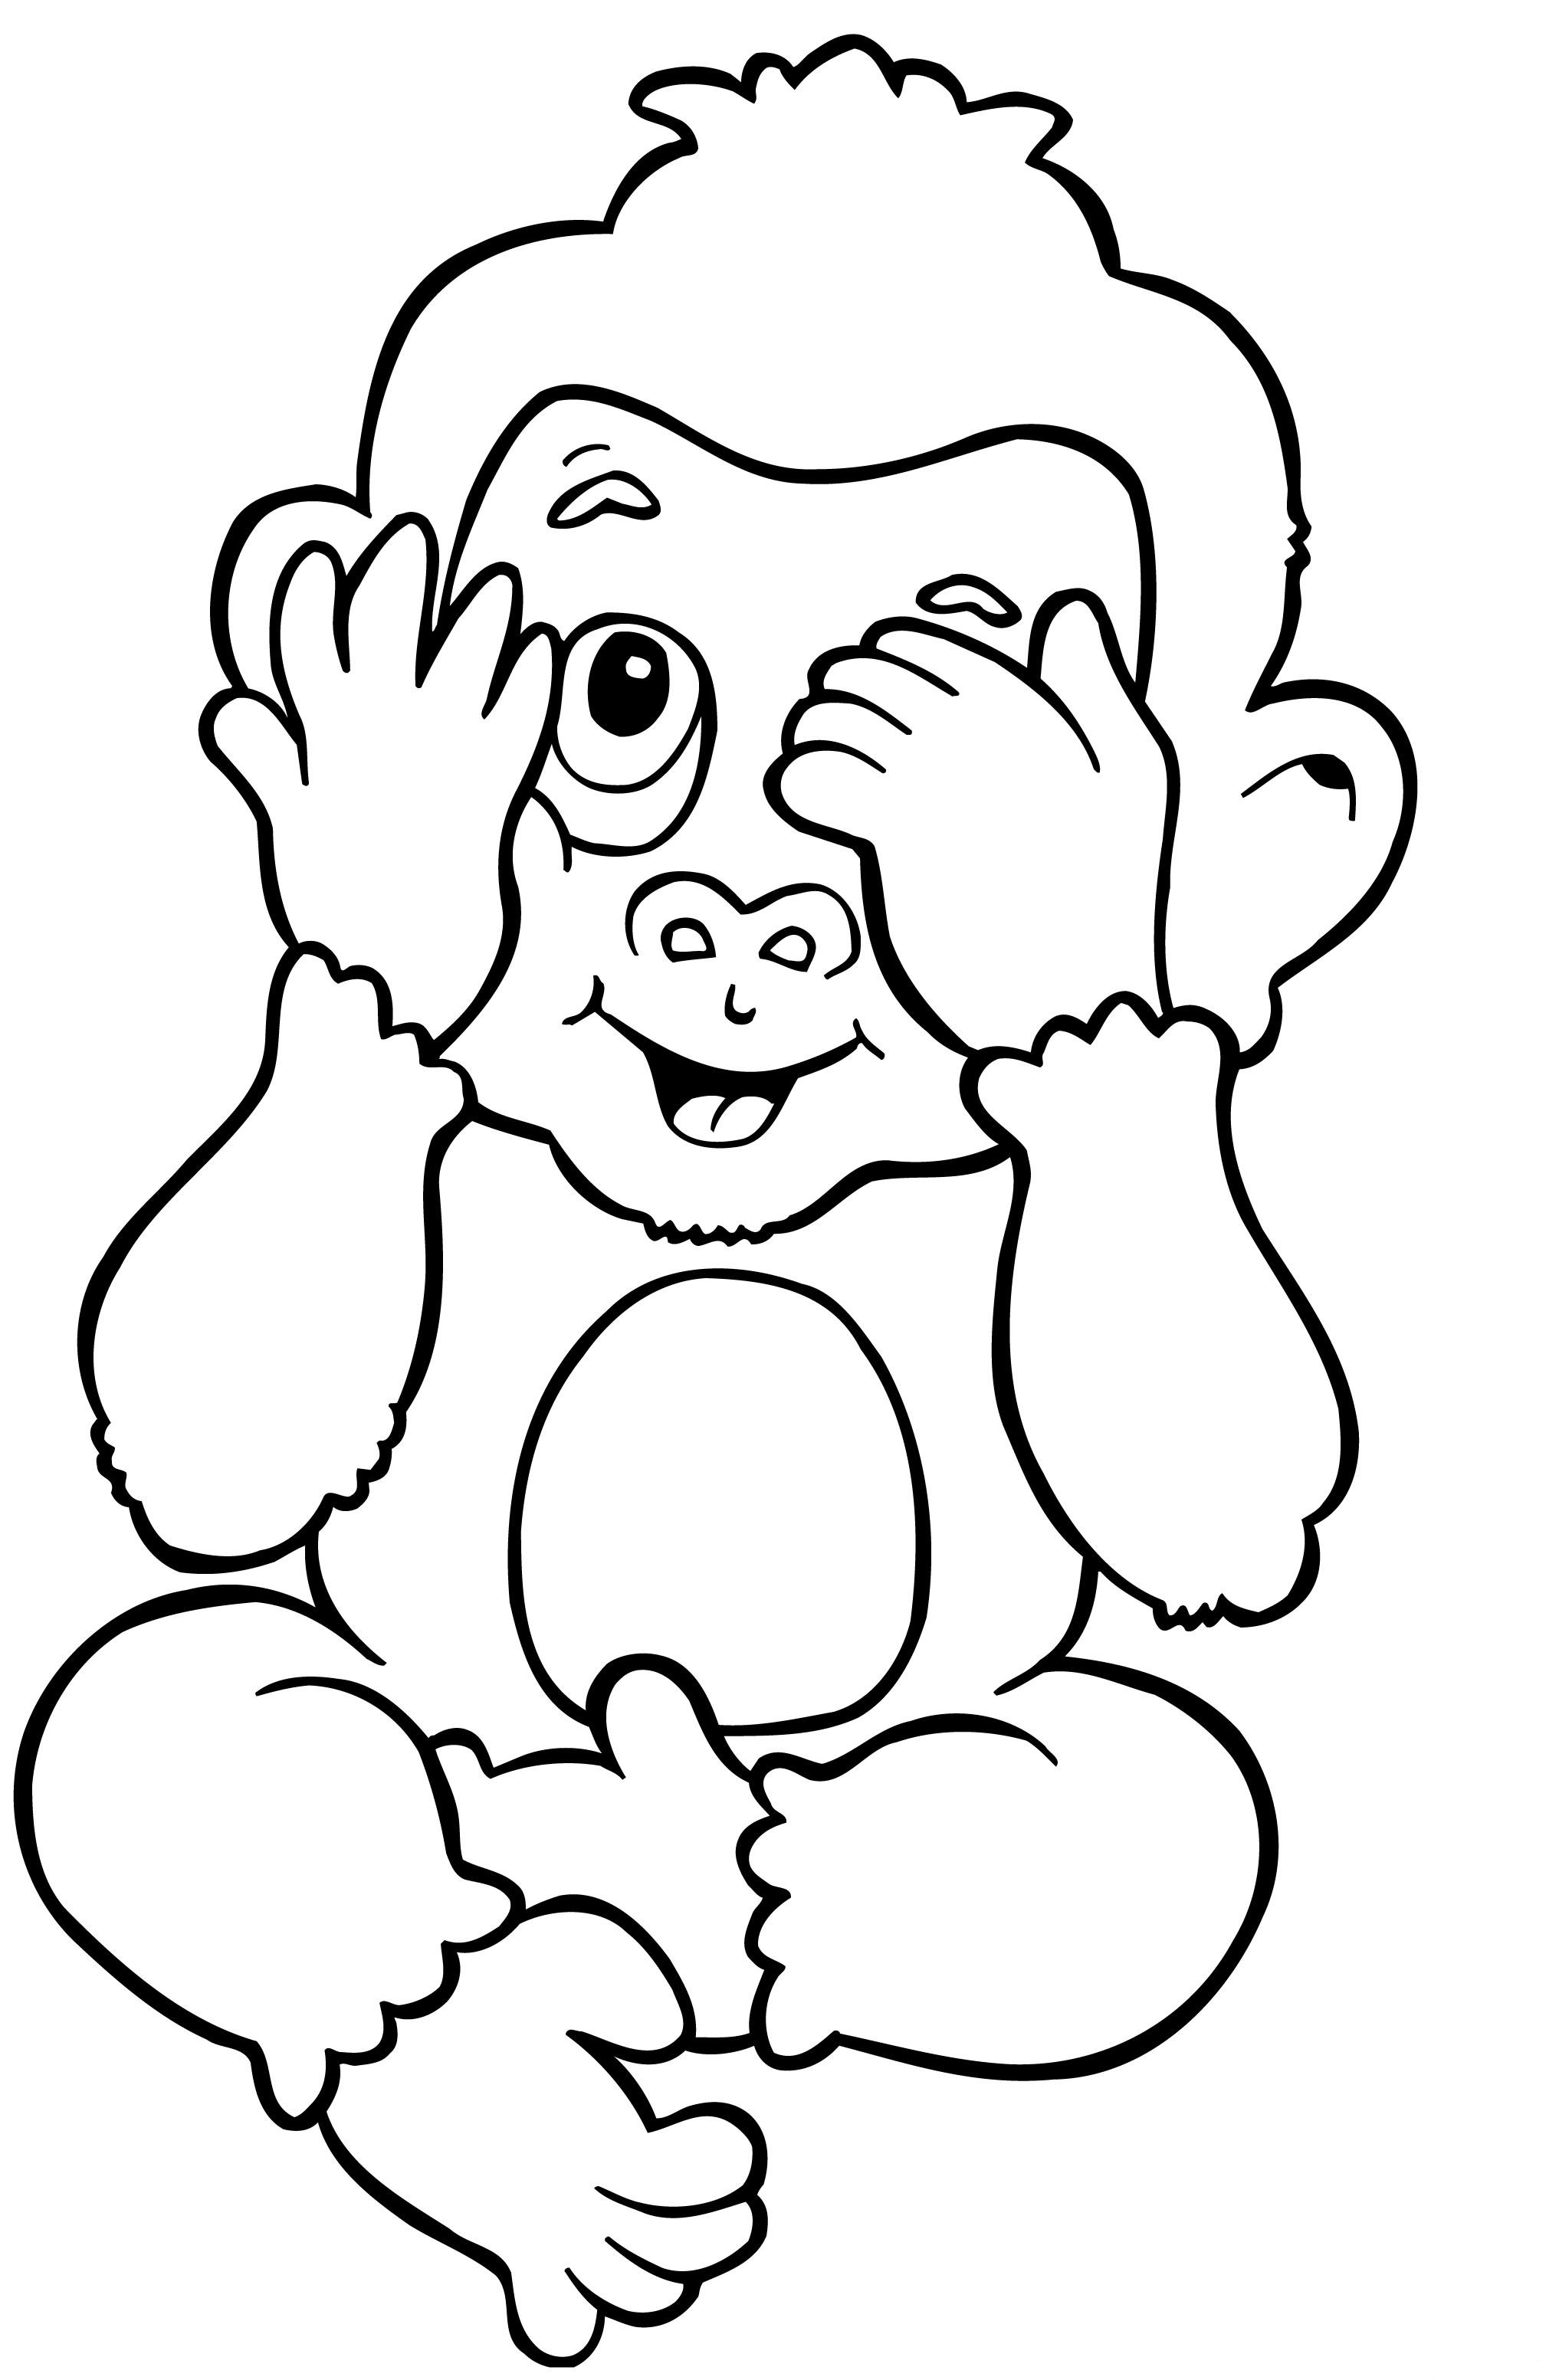 Desenho De Macaco Bebe Para Colorir Tudodesenhos